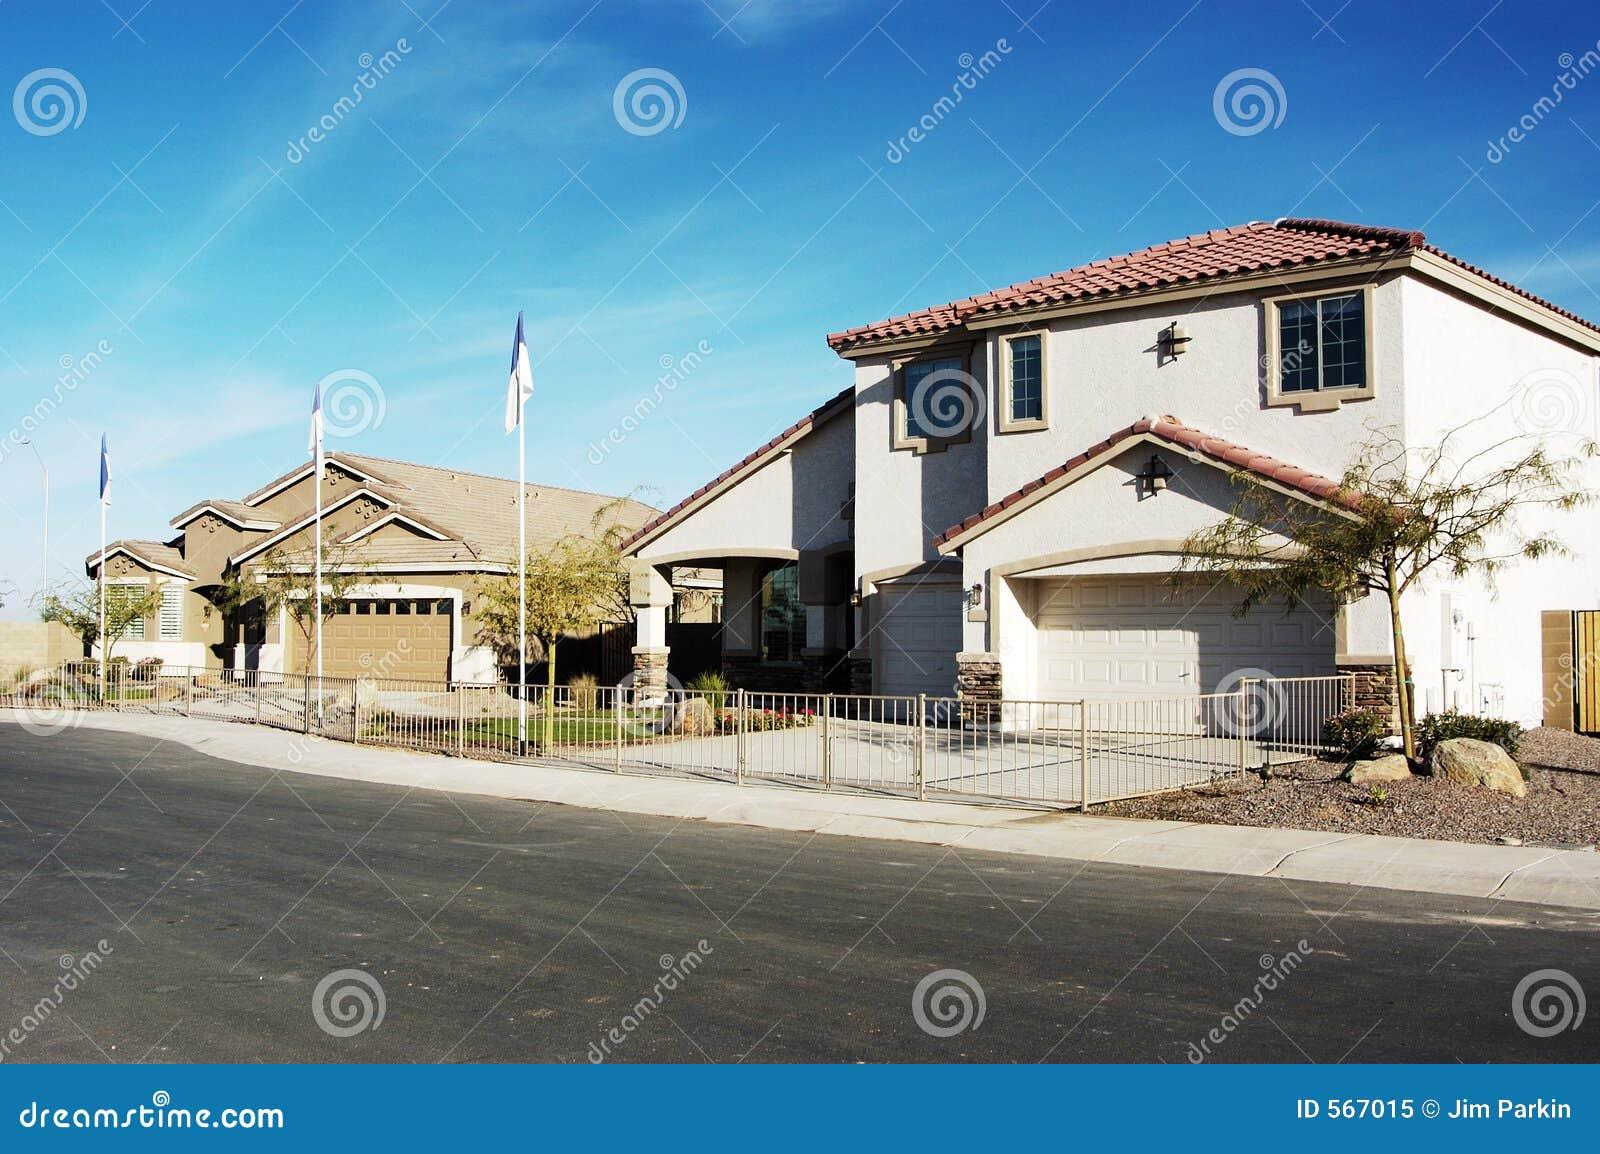 New model homes stock image image of models southwest for New home models